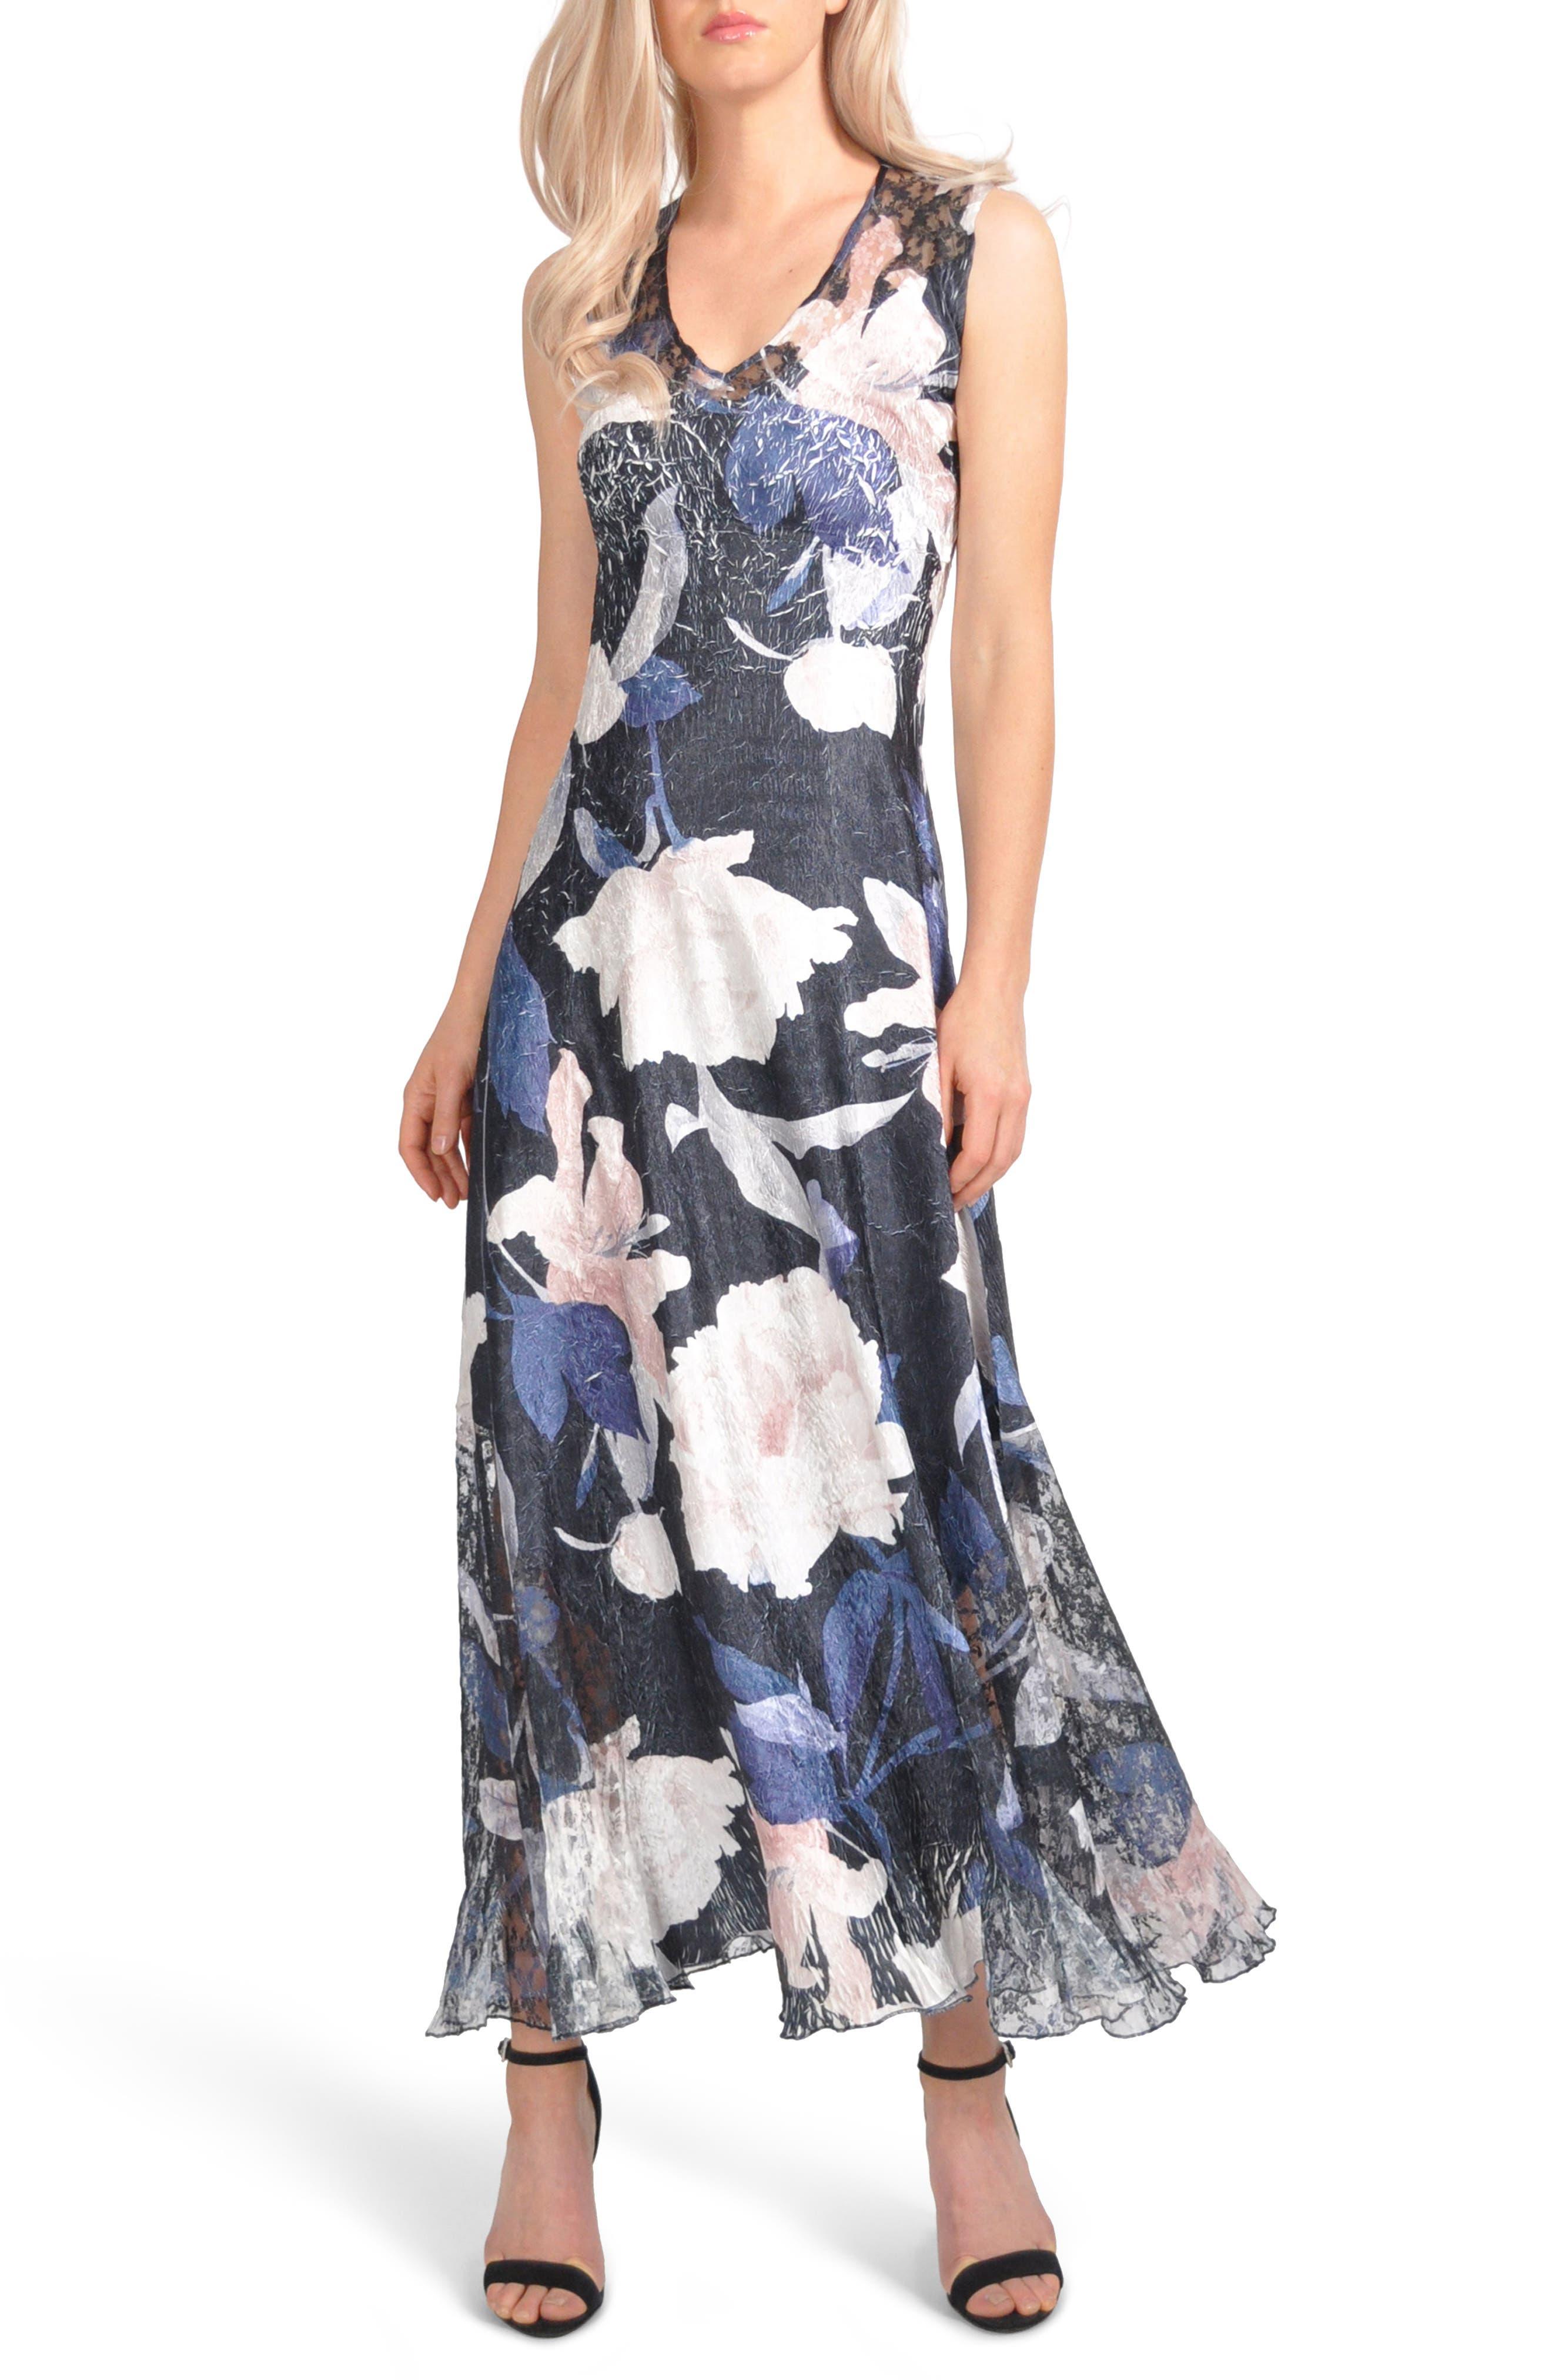 Lace-Up Maxi Dress